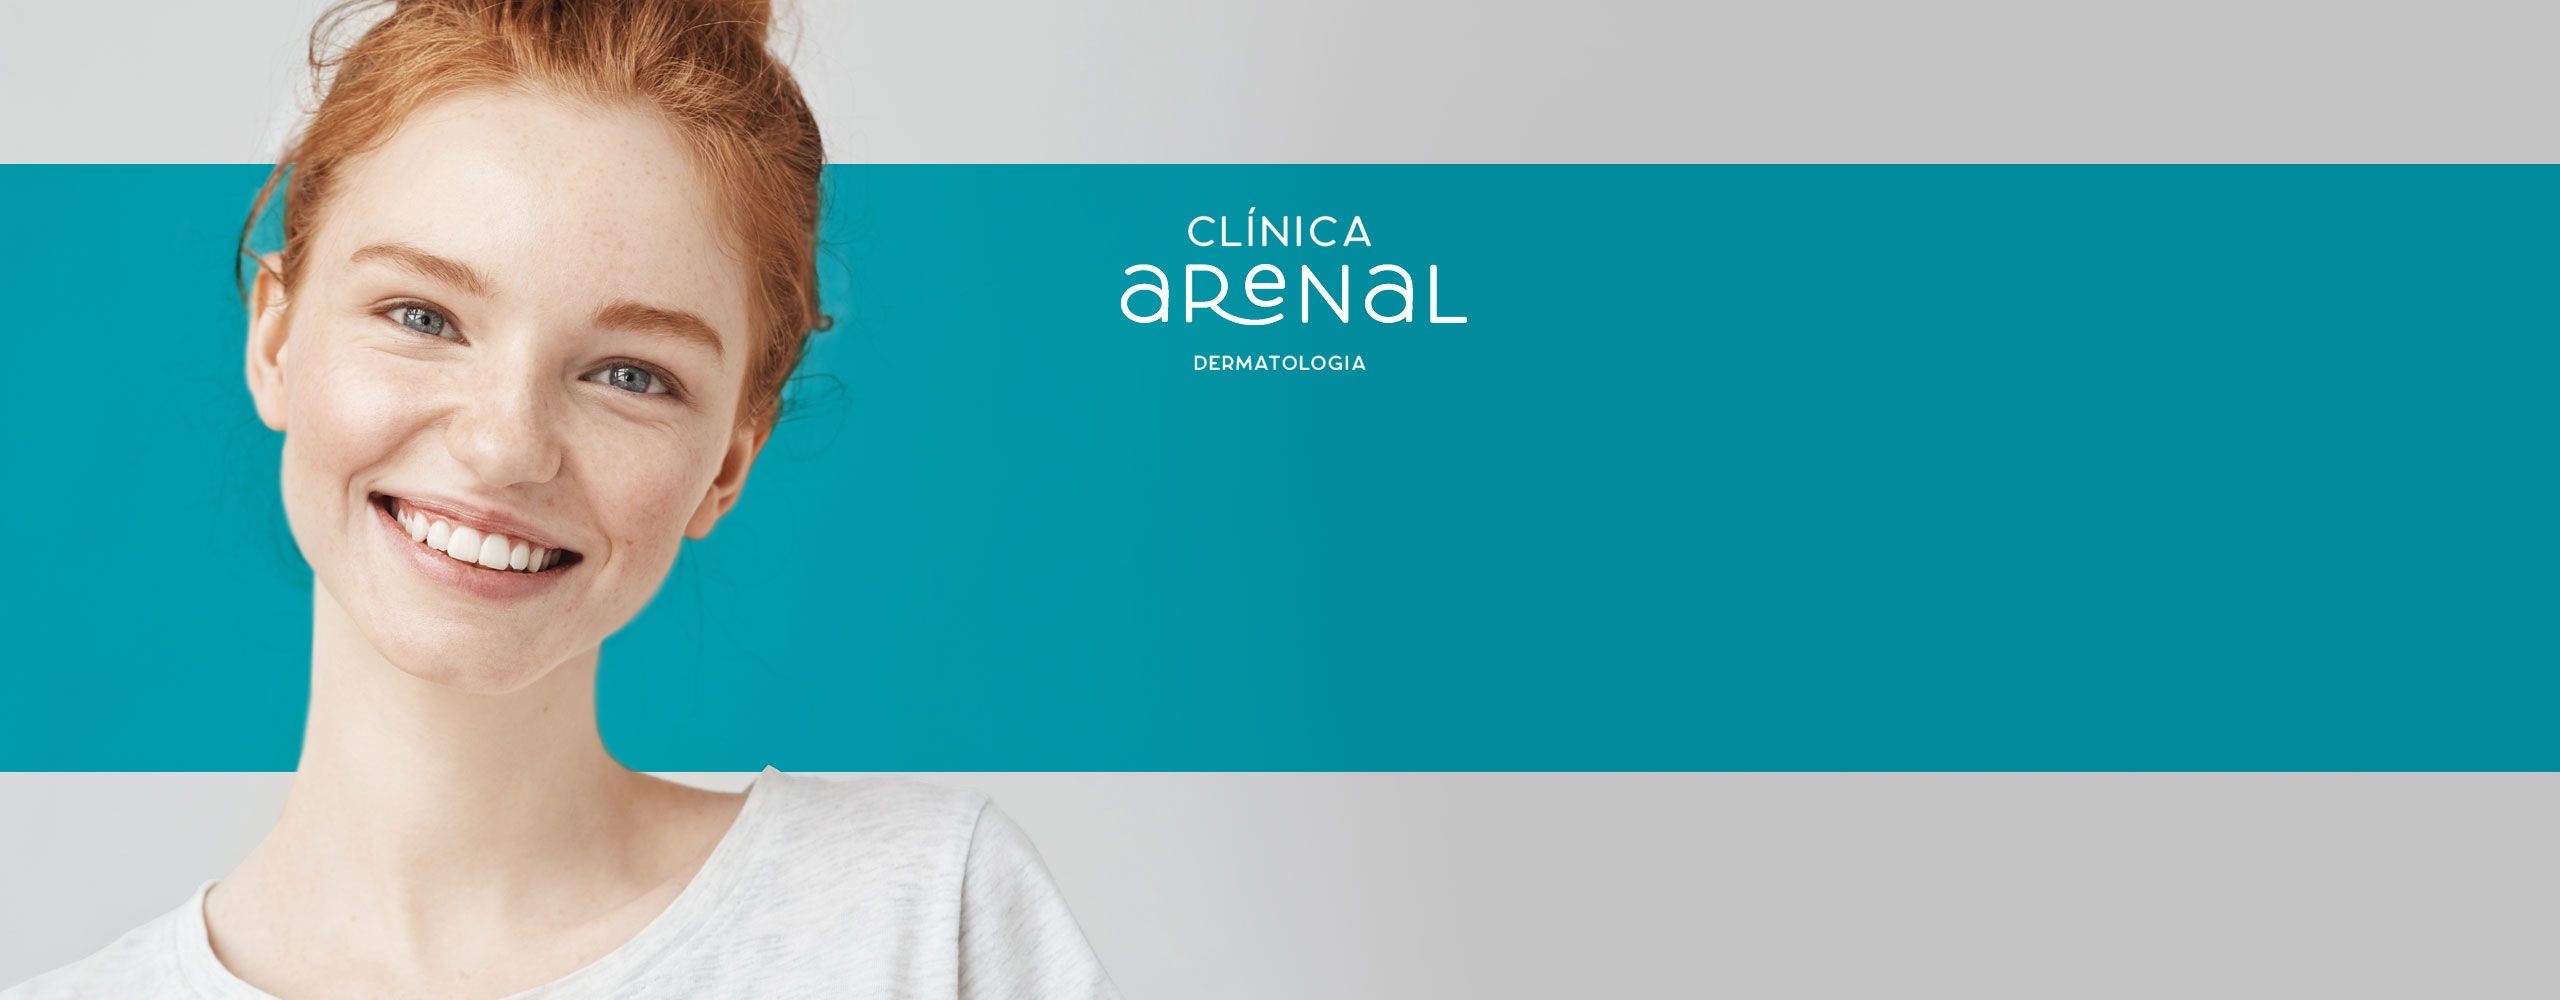 Dermatología Clínica Arenal